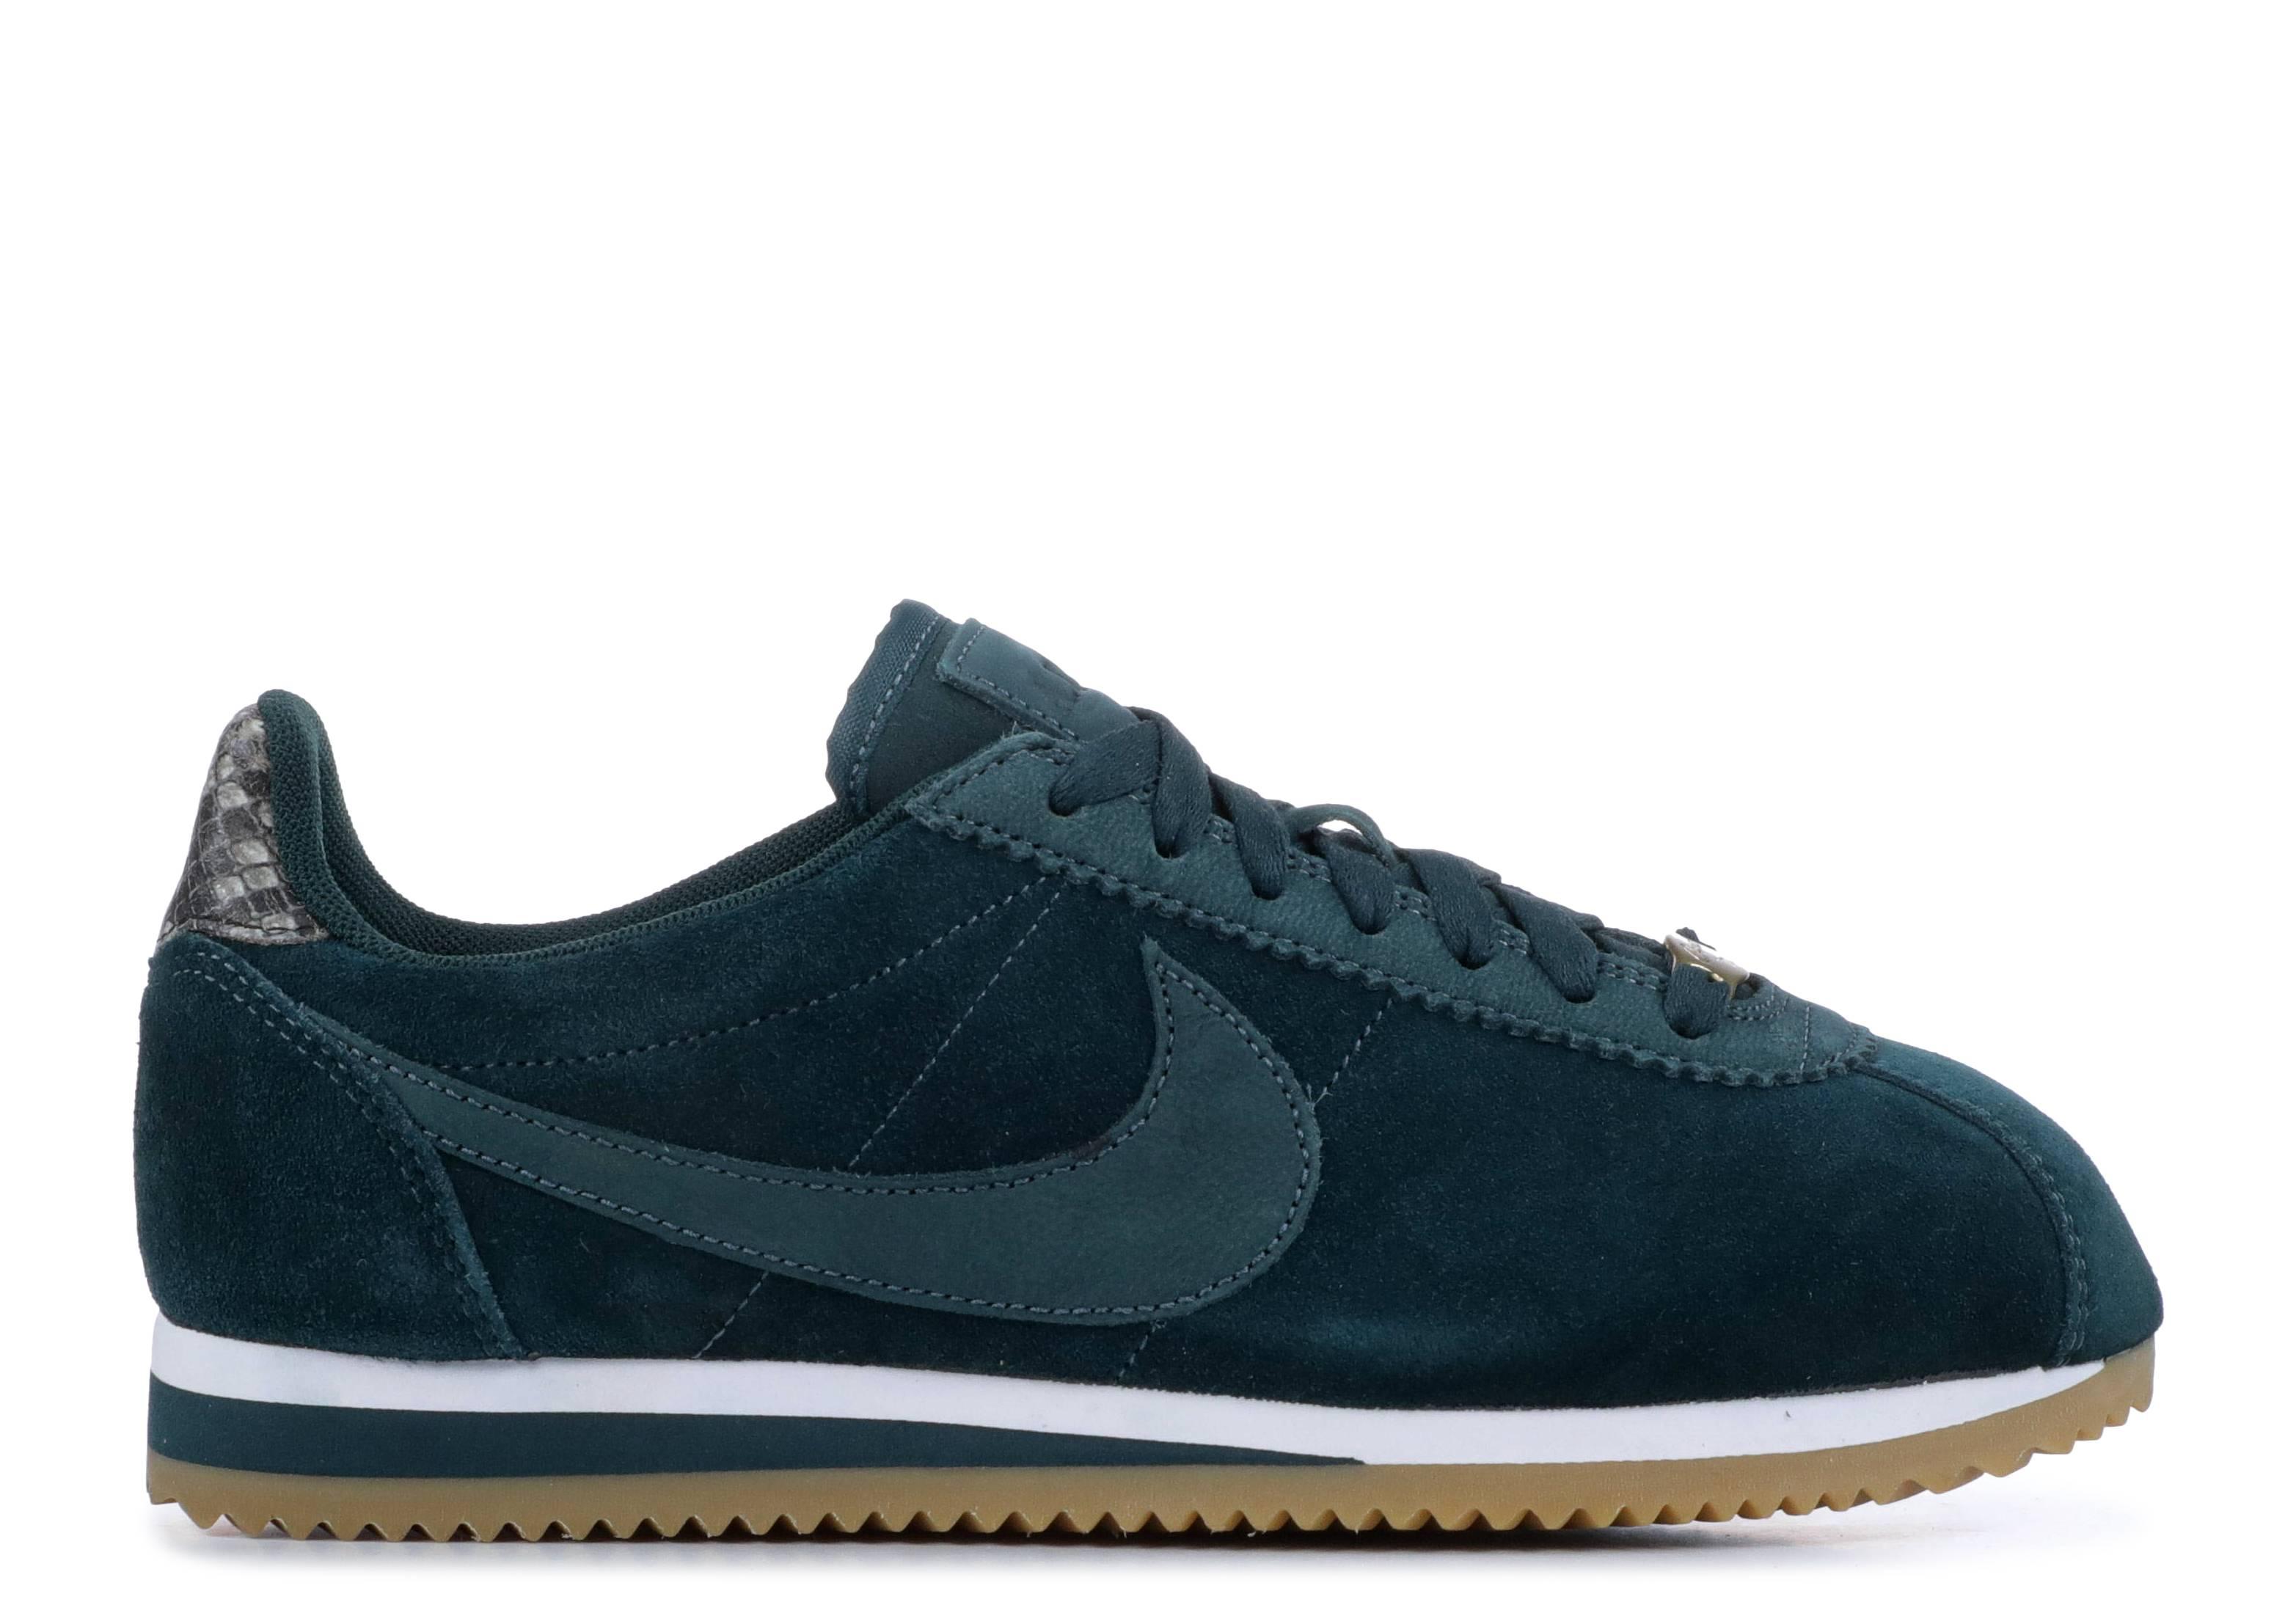 promo code 43c88 2cb1a Wmns Classic Cortez Alc Prem - Nike - ah5206 300 - midnight ...